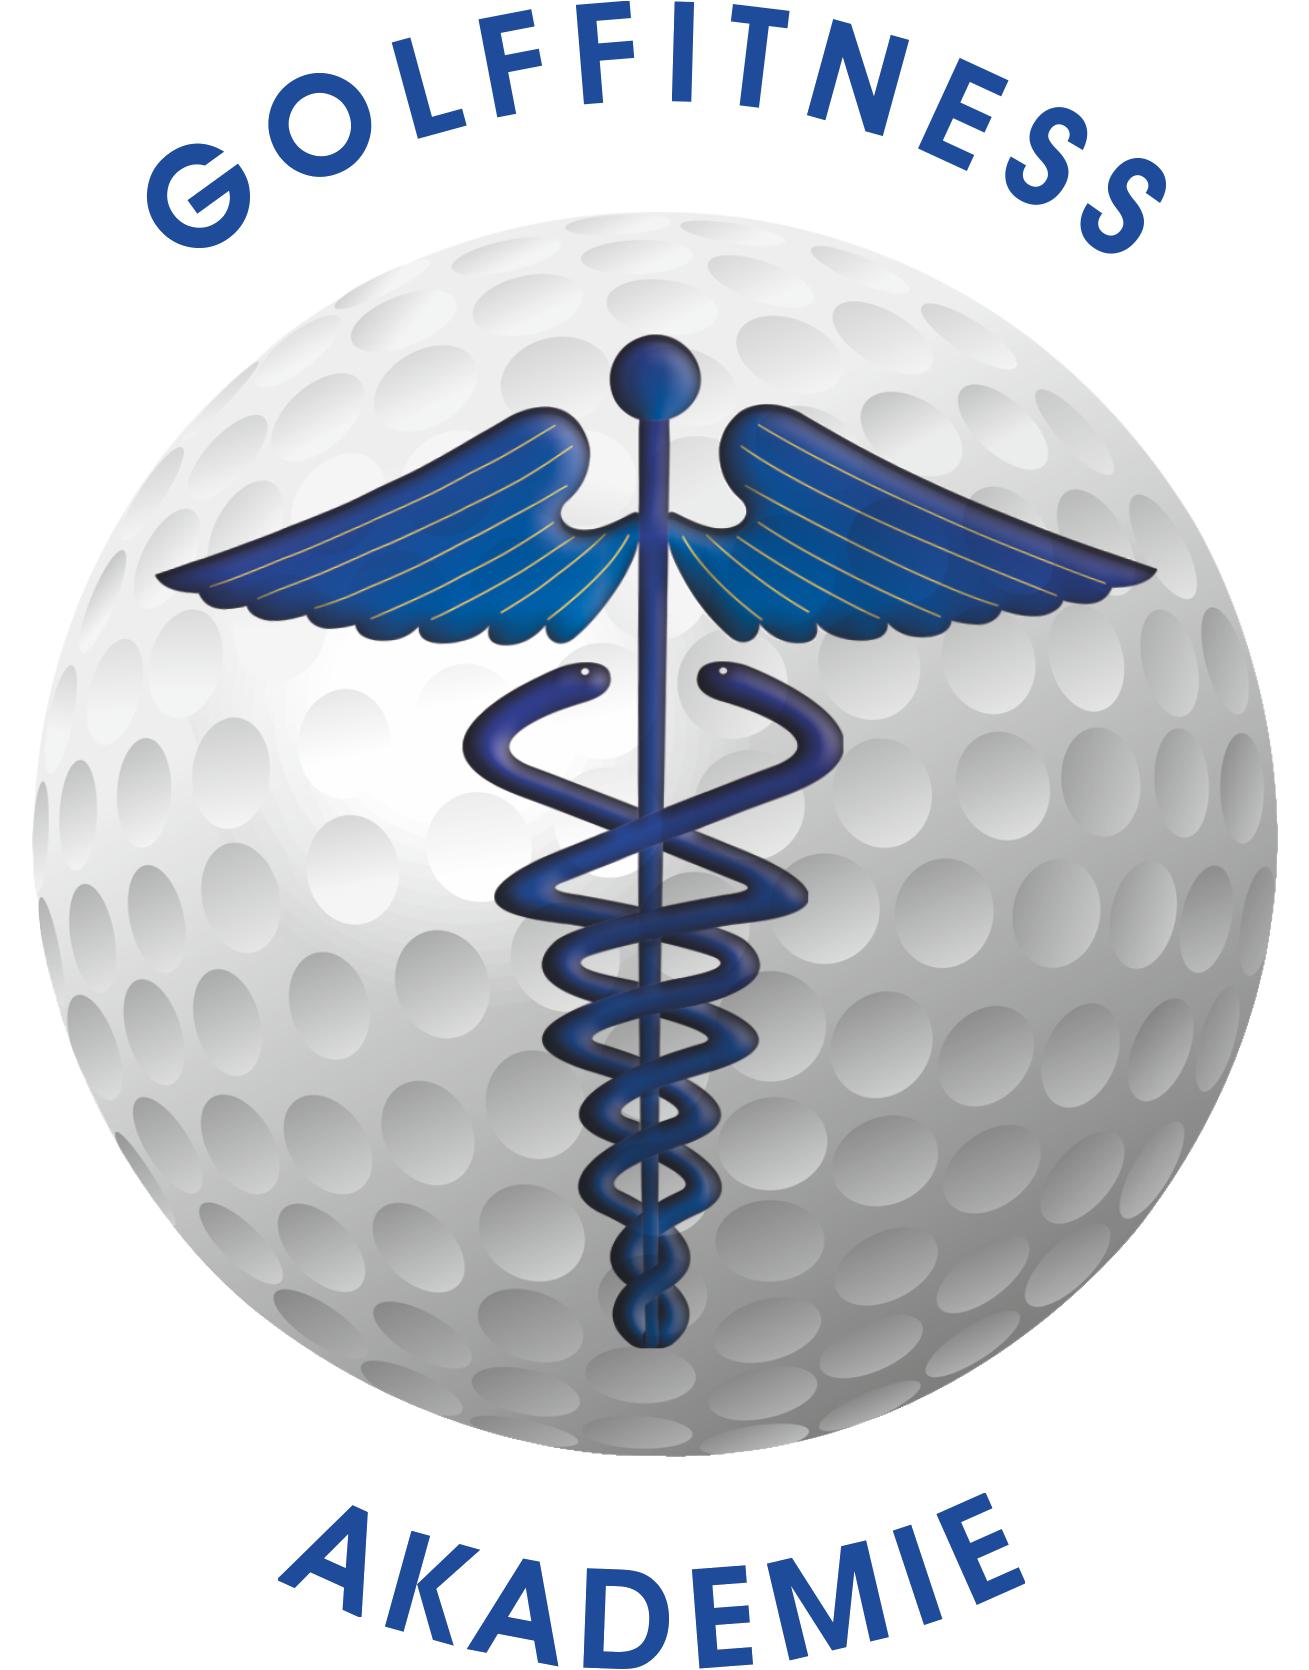 Golffitness Akademie